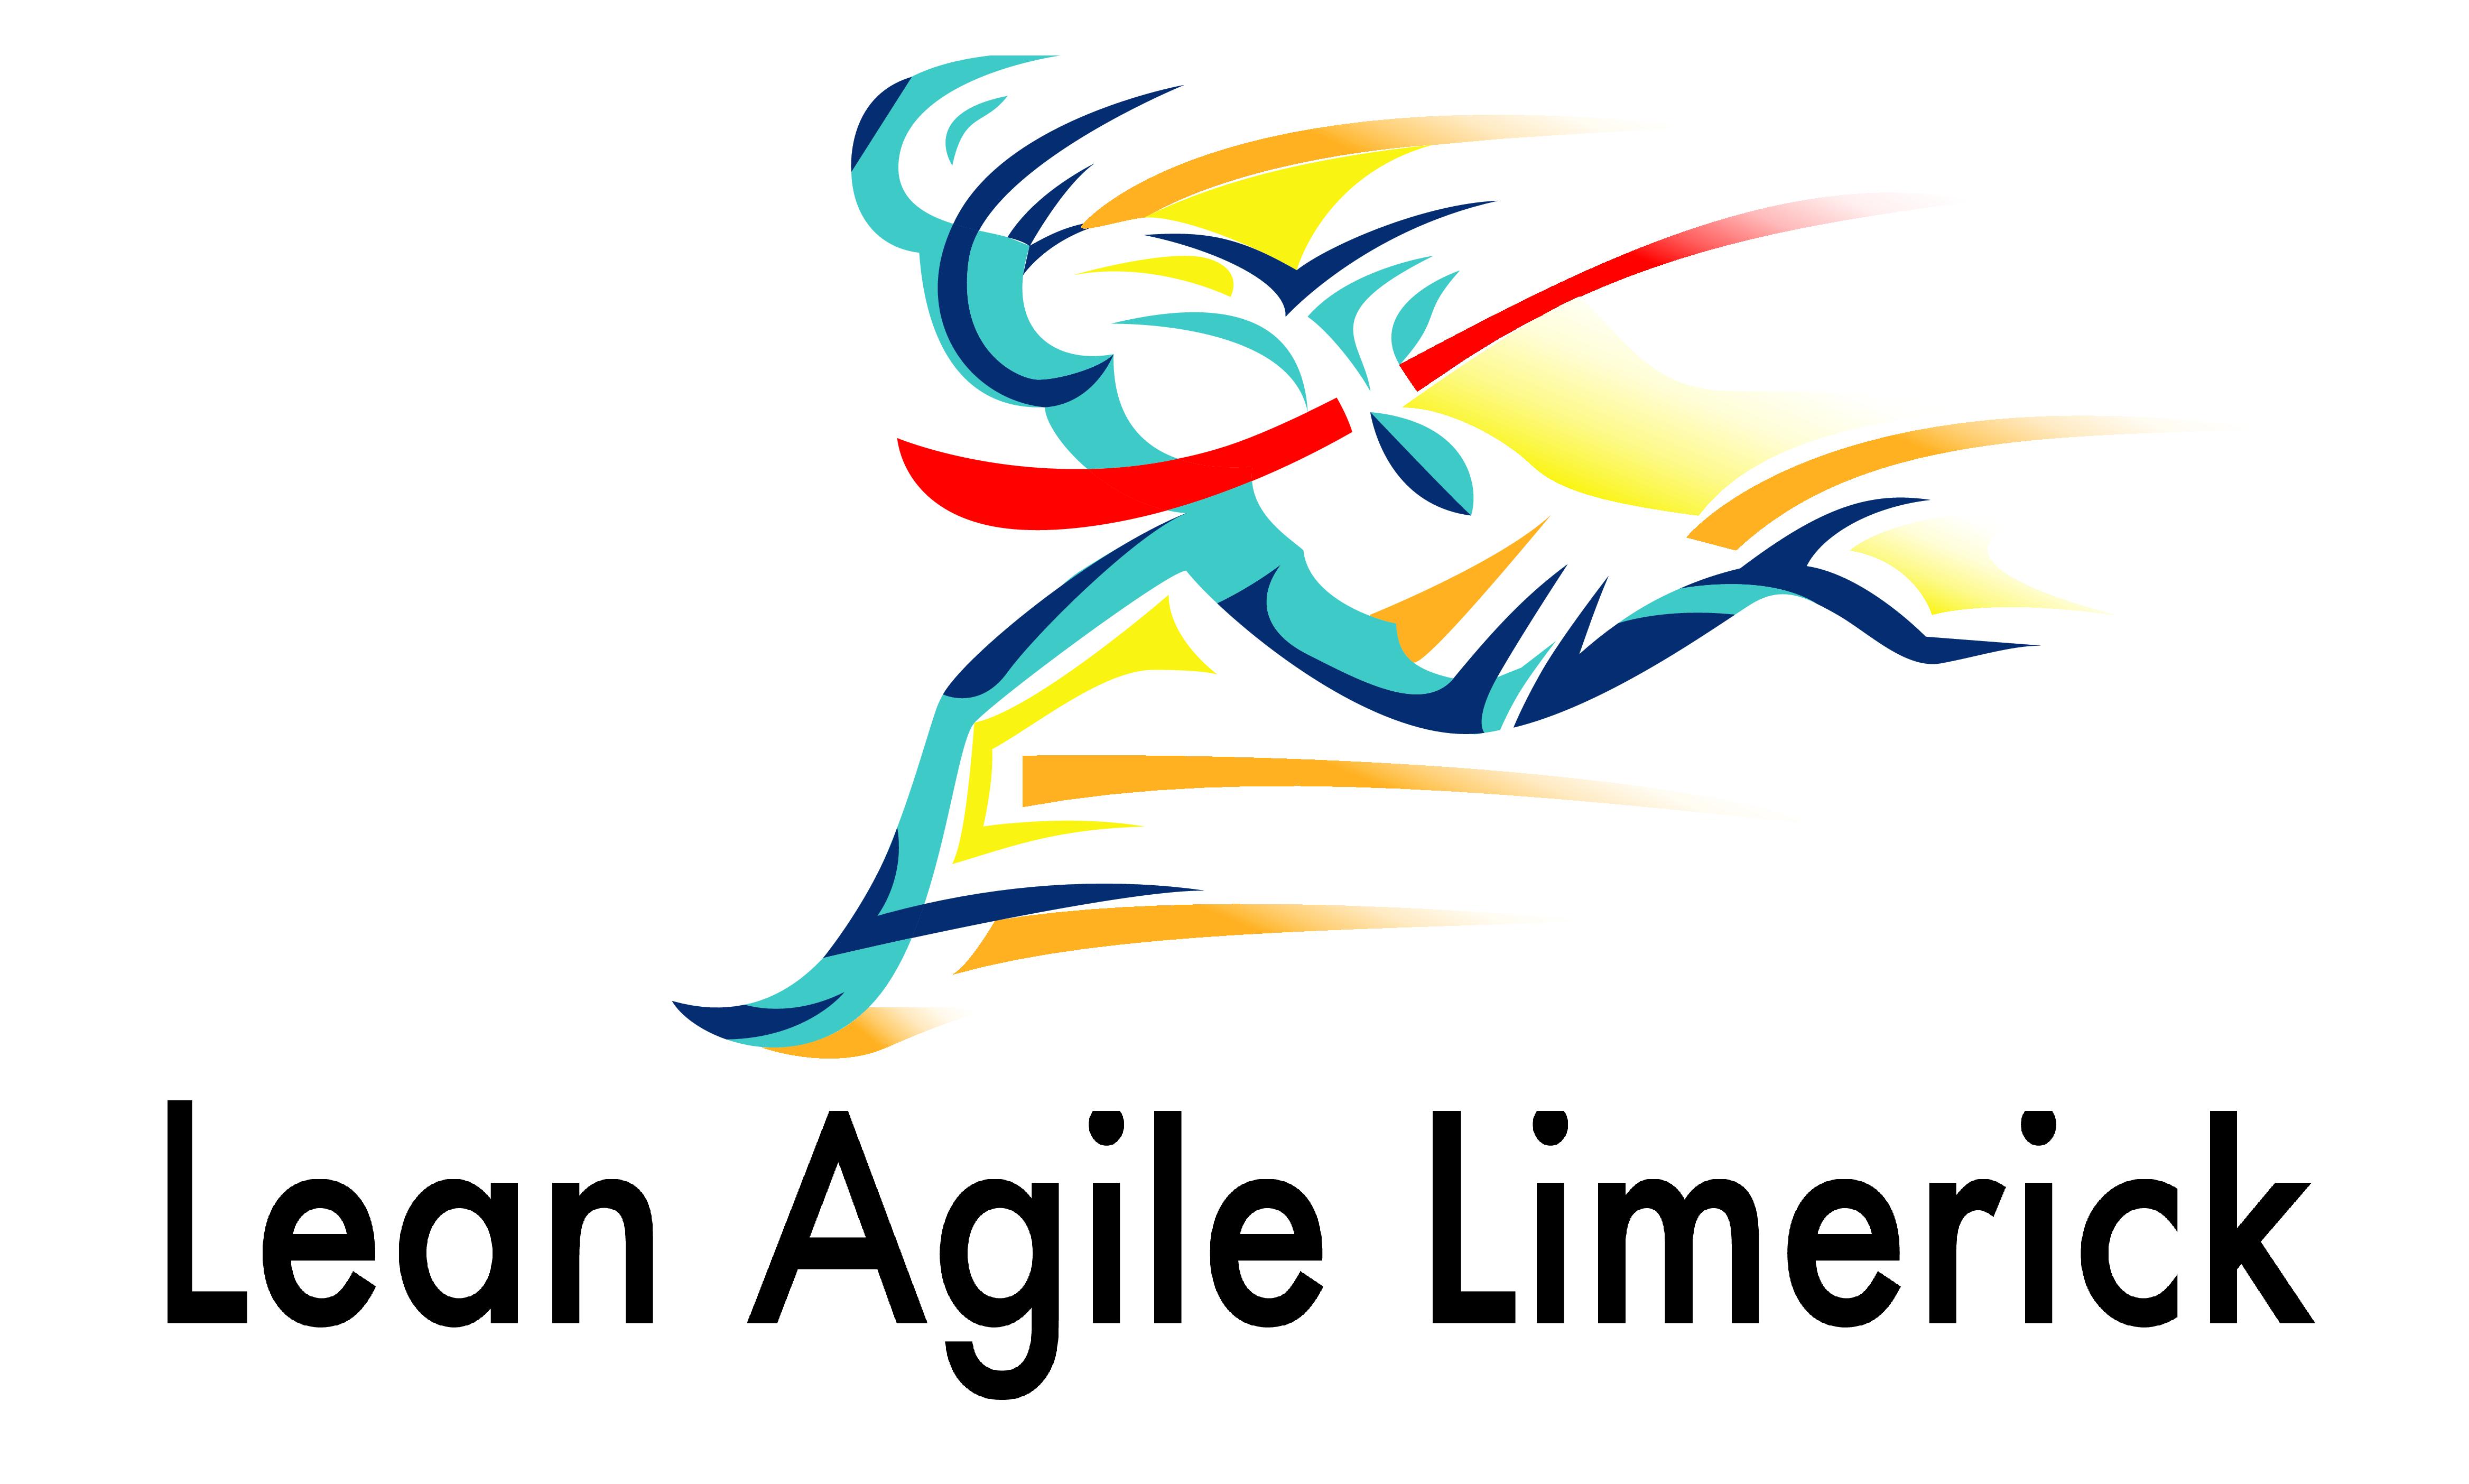 Lean Agile Limerick (LAL)